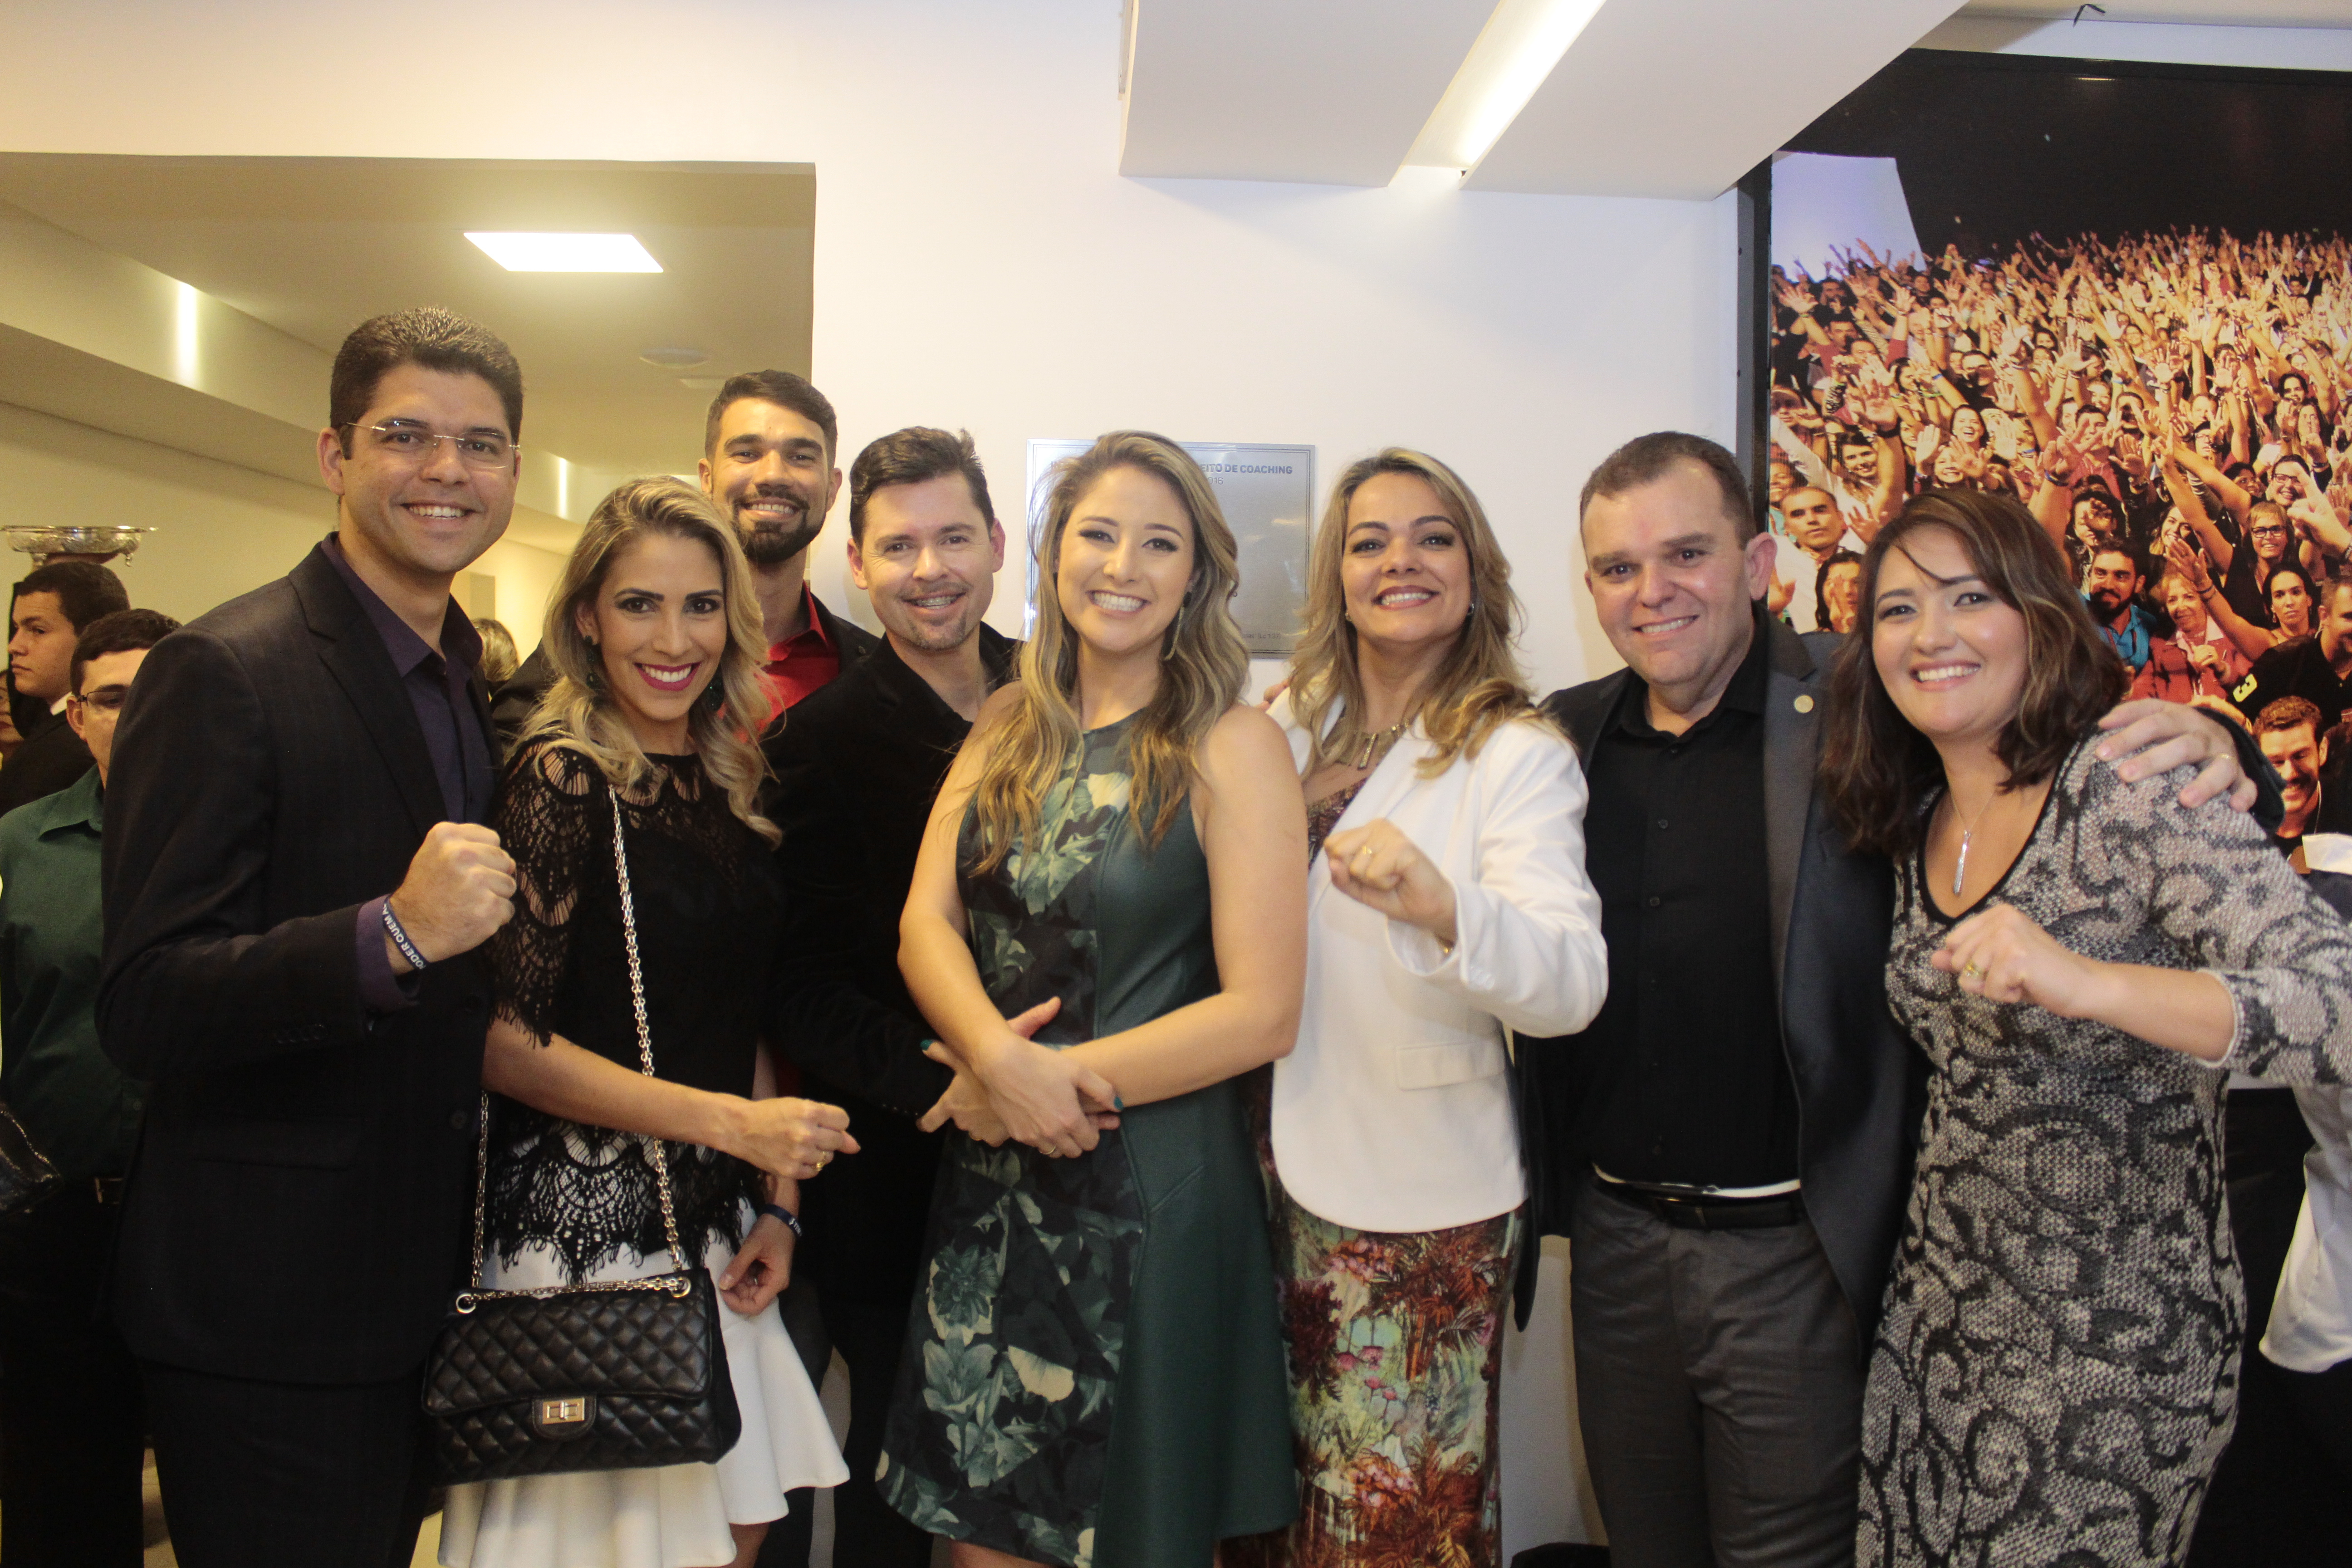 Ronald Gomes, Aline marra, Gustavo Sampaio, Luiz Paulo, Thais Machado, Fabiane Kesseler, Giovanni Brito e Taís Santos